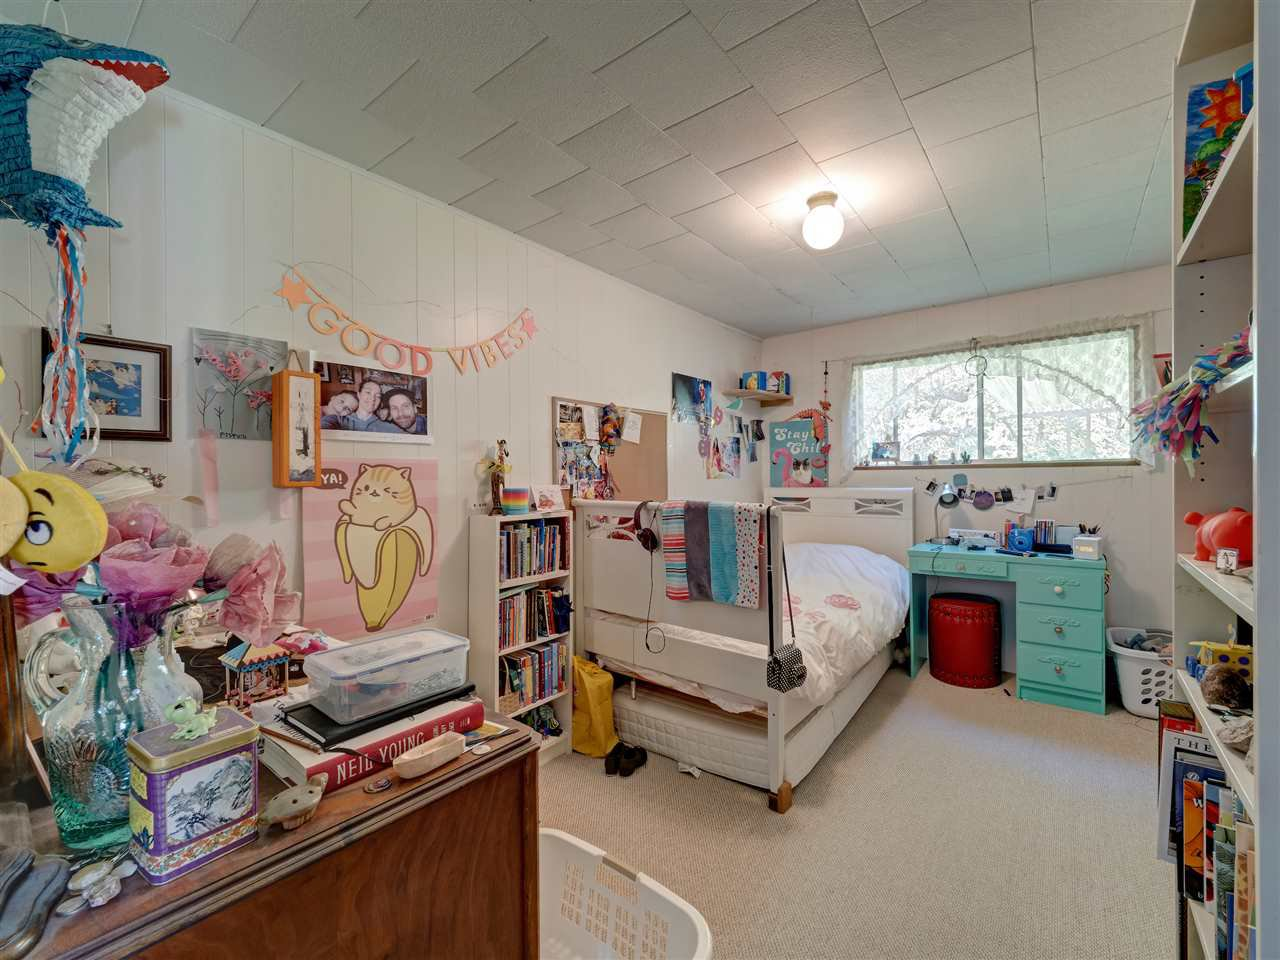 Photo 19: Photos: 5761 MCLAUGHAN Road in Sechelt: Sechelt District House for sale (Sunshine Coast)  : MLS®# R2479077